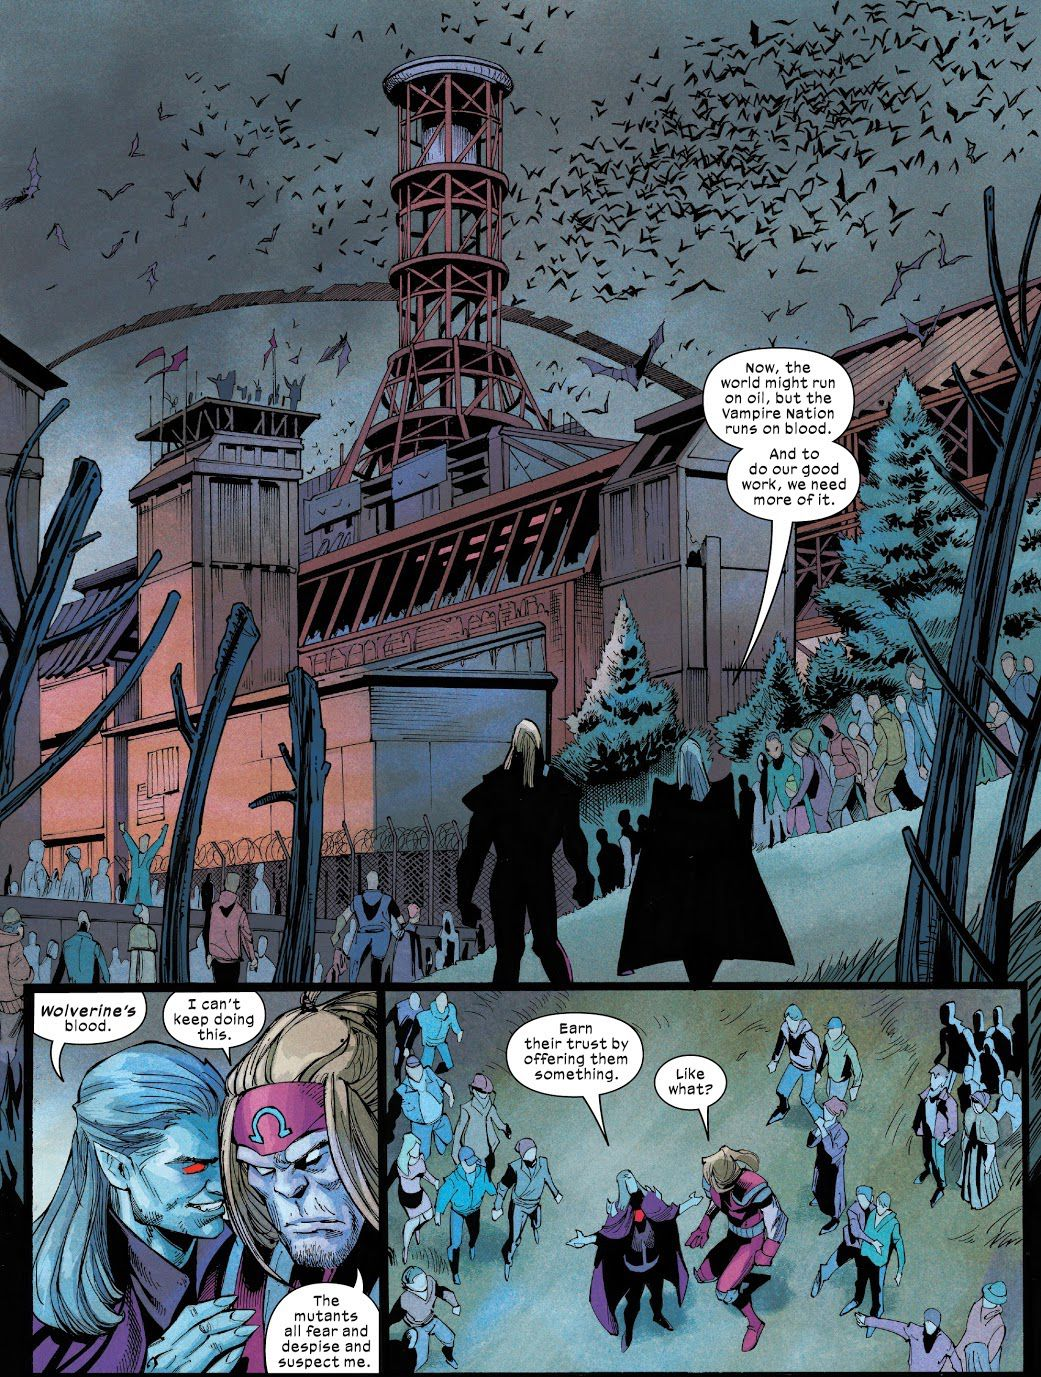 Dracula advises Omega Red on how to infiltrate Krakoa from the vampire settlement in Chernobyl in Wolverine #11, Marvel Comics (2021).